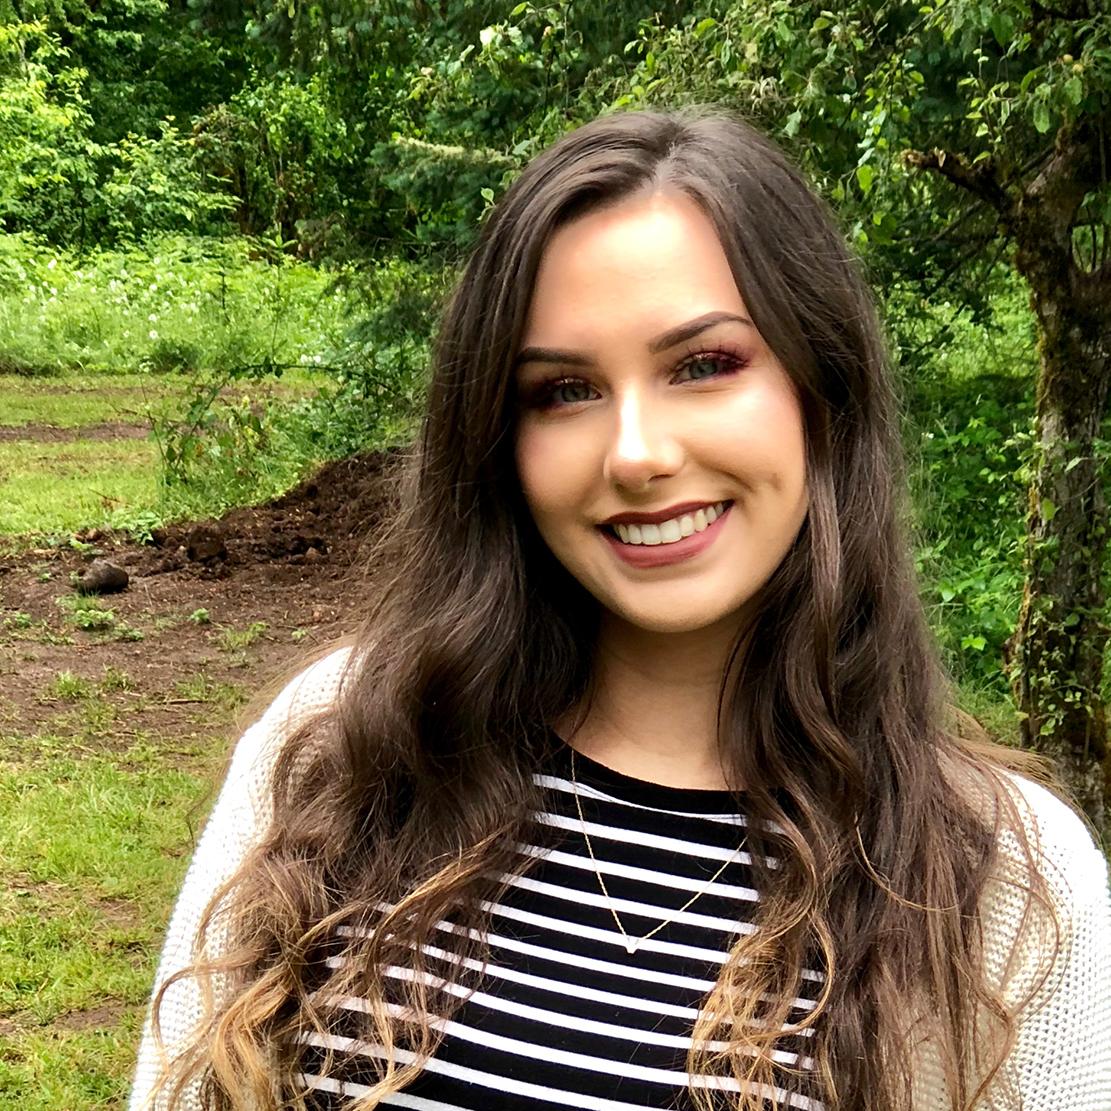 Spotlight Interview with Alyssa York